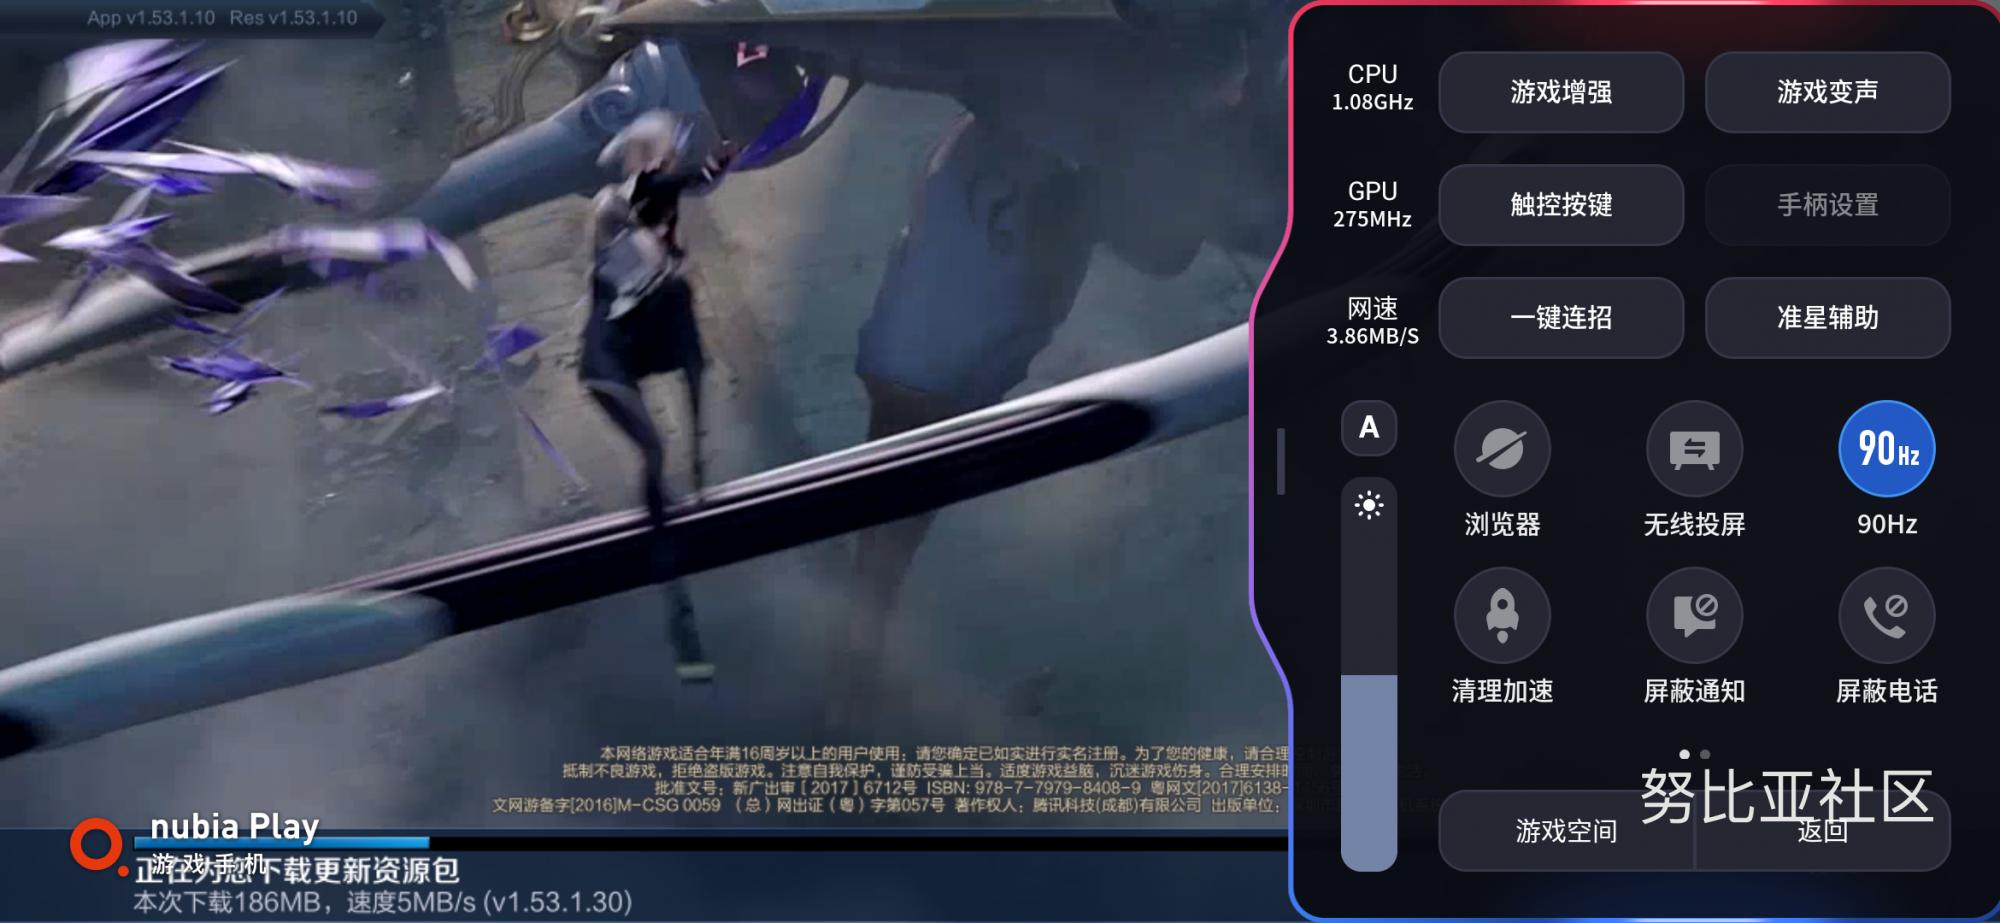 Screenshot_王者荣耀_2020-05-17-23-01-41-662.png